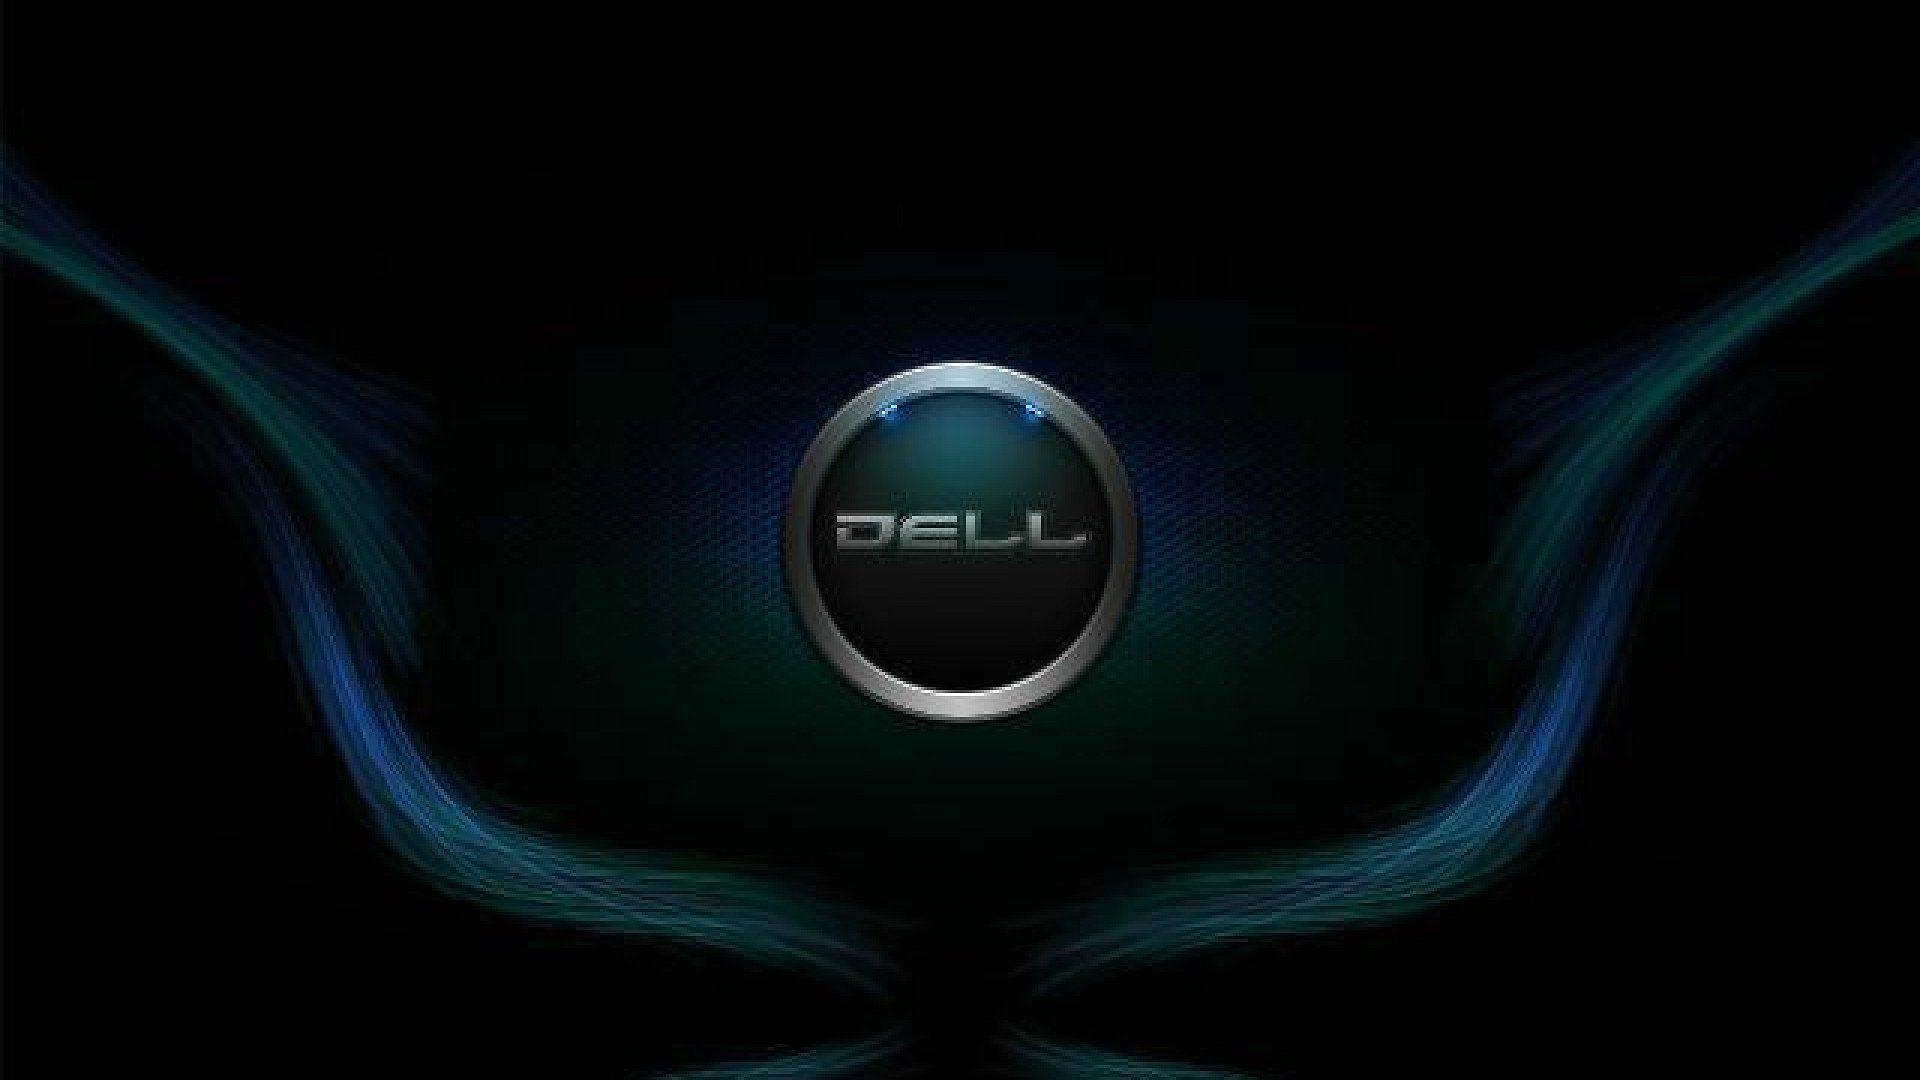 Dell 1080p wallpaper